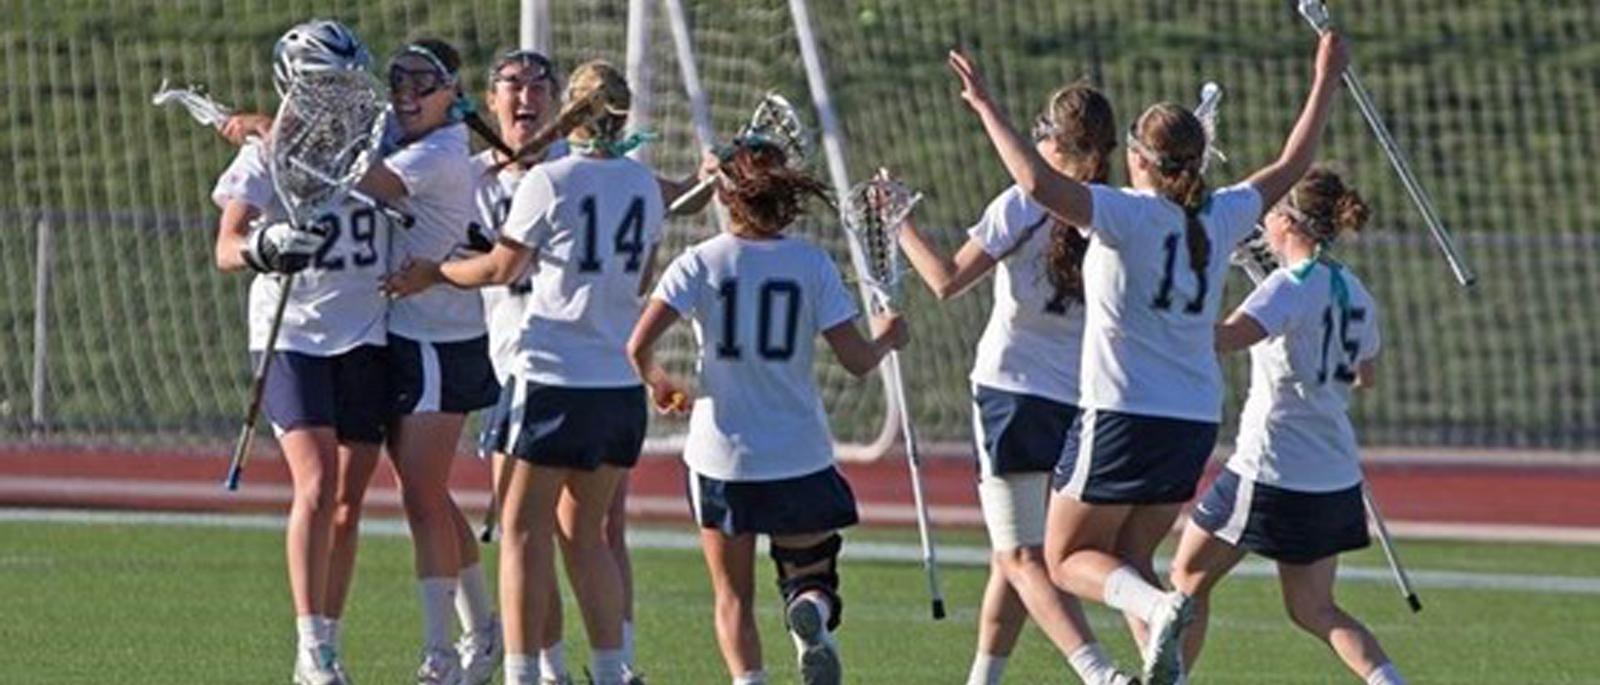 UNH Women's Lacrosse team celebrating a goal